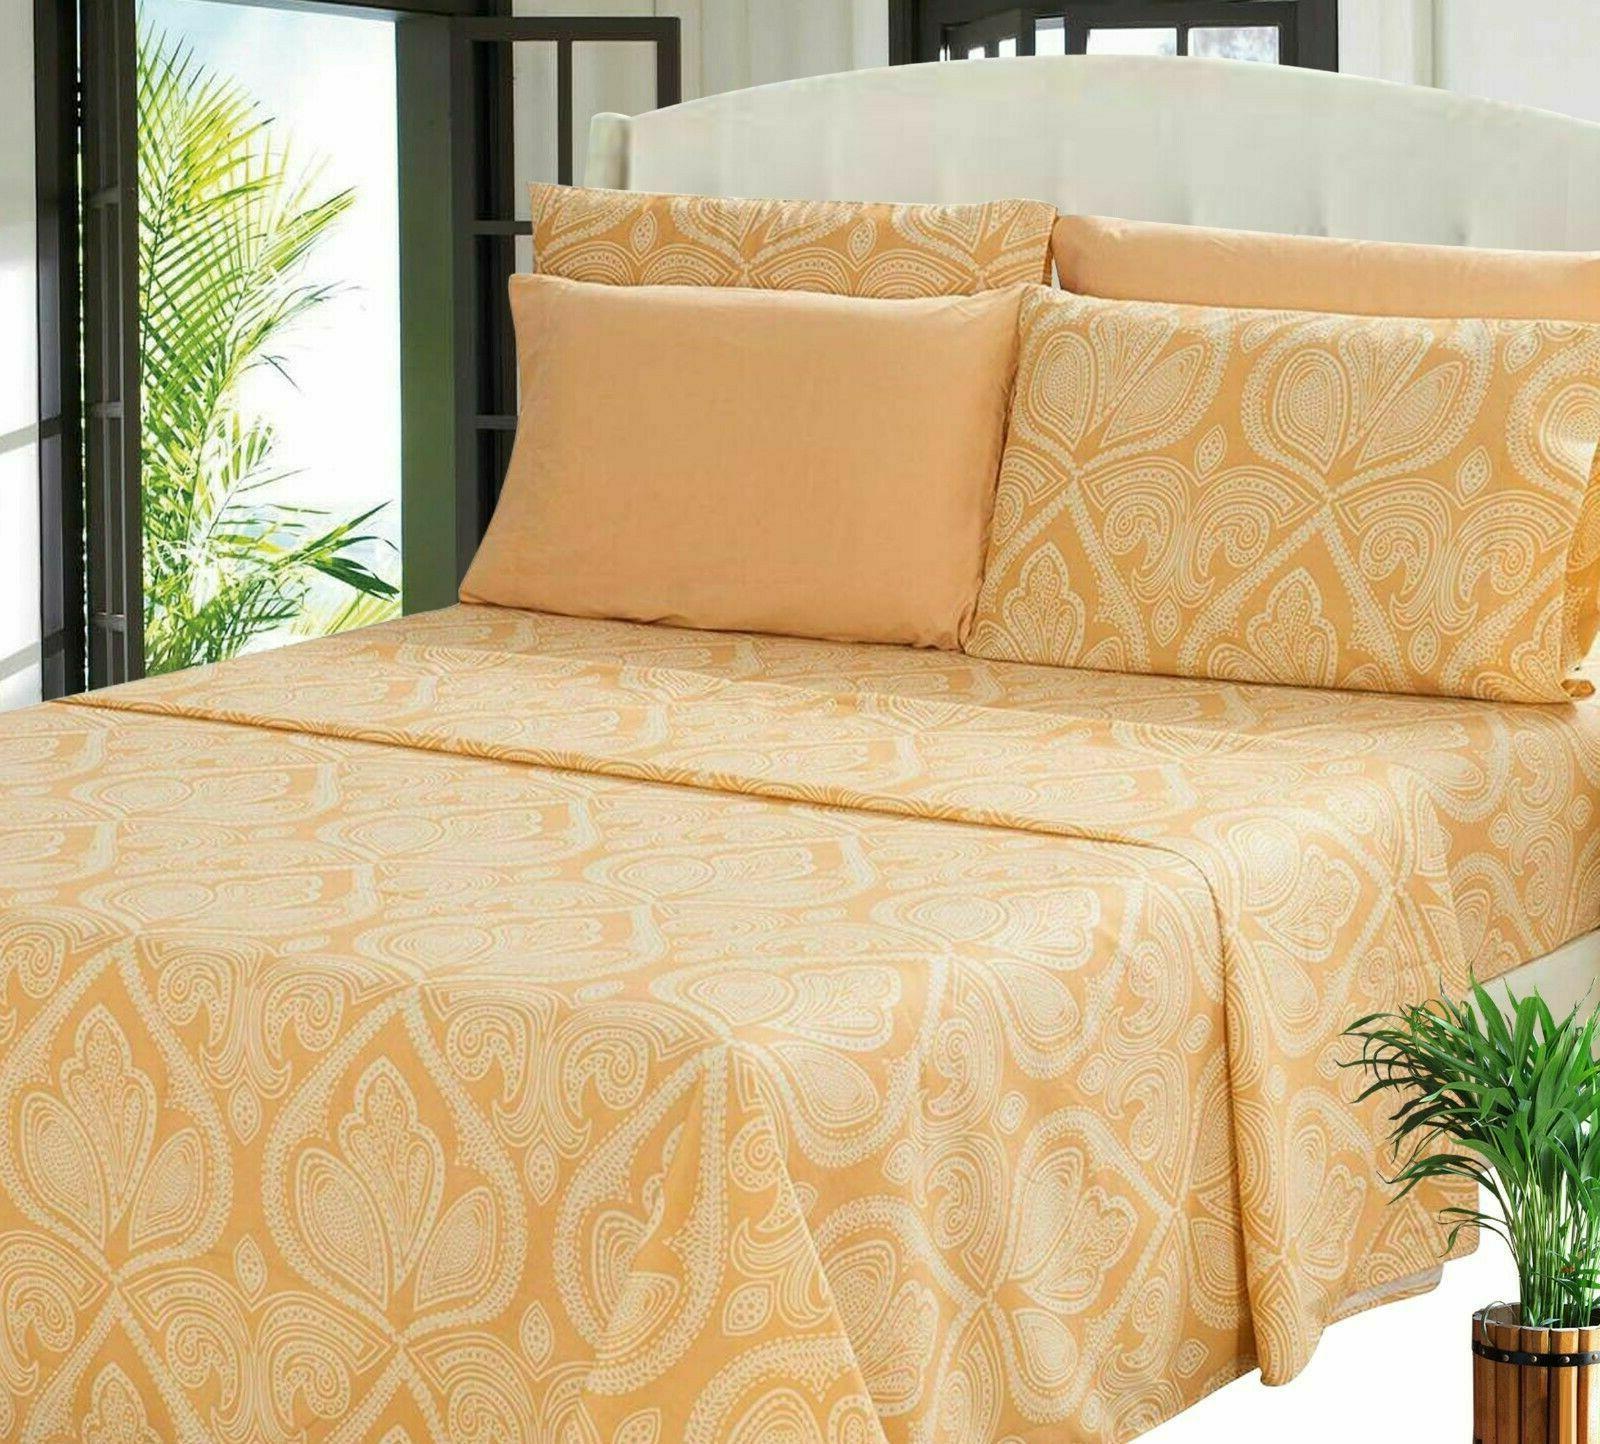 Deep 6 Bed Set 1800 Count Egyptian Sheet